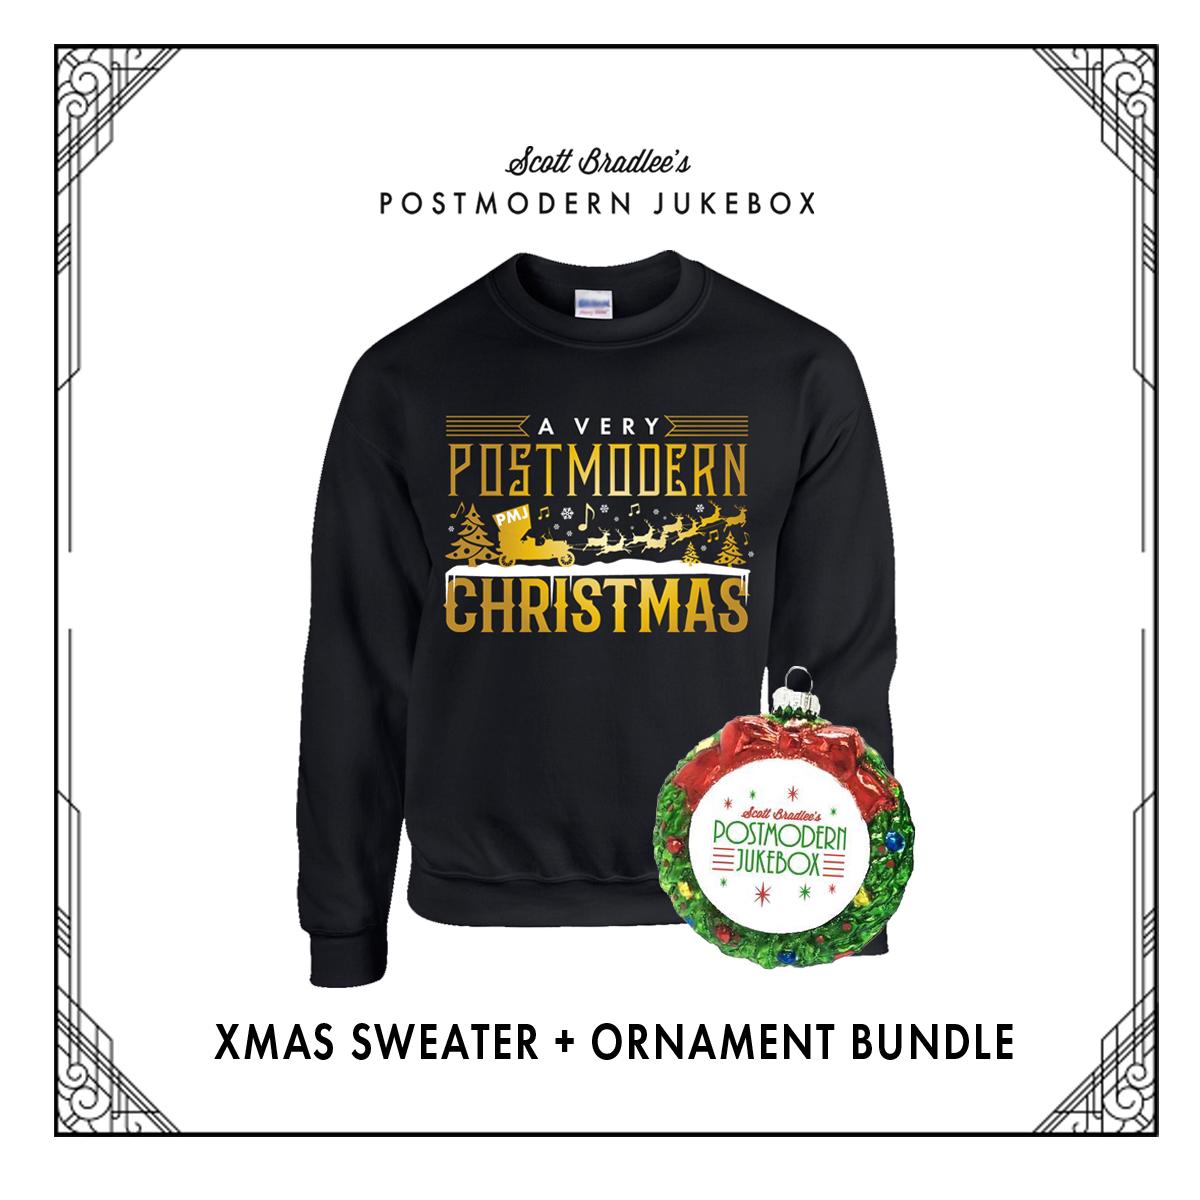 Xmas Sweater & Ornament Bundle